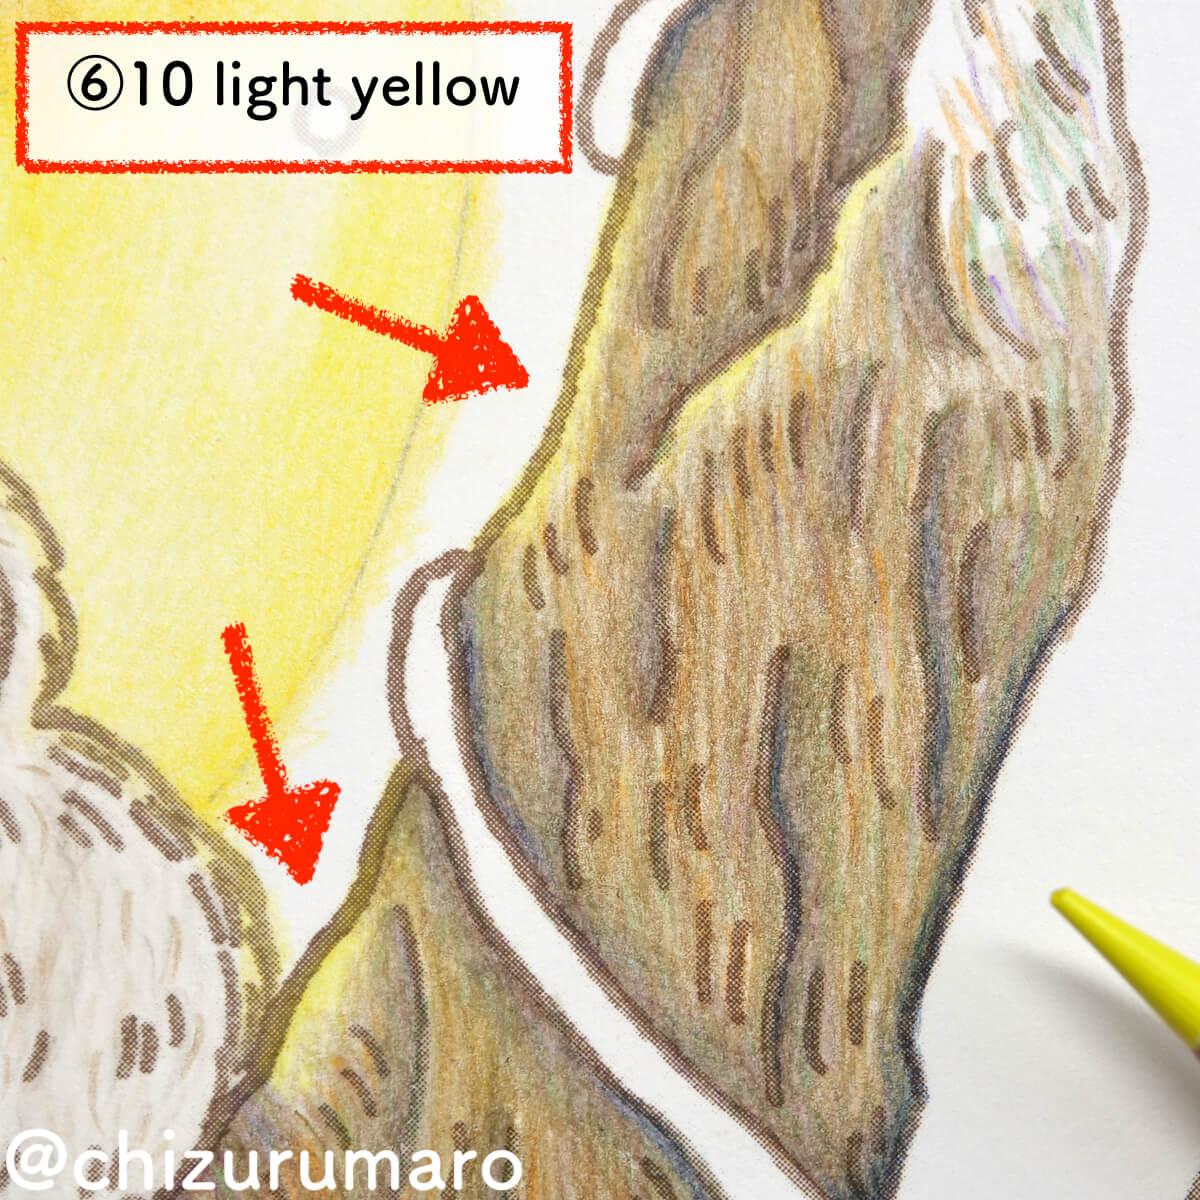 f:id:chizurumaro:20201203205048j:plain